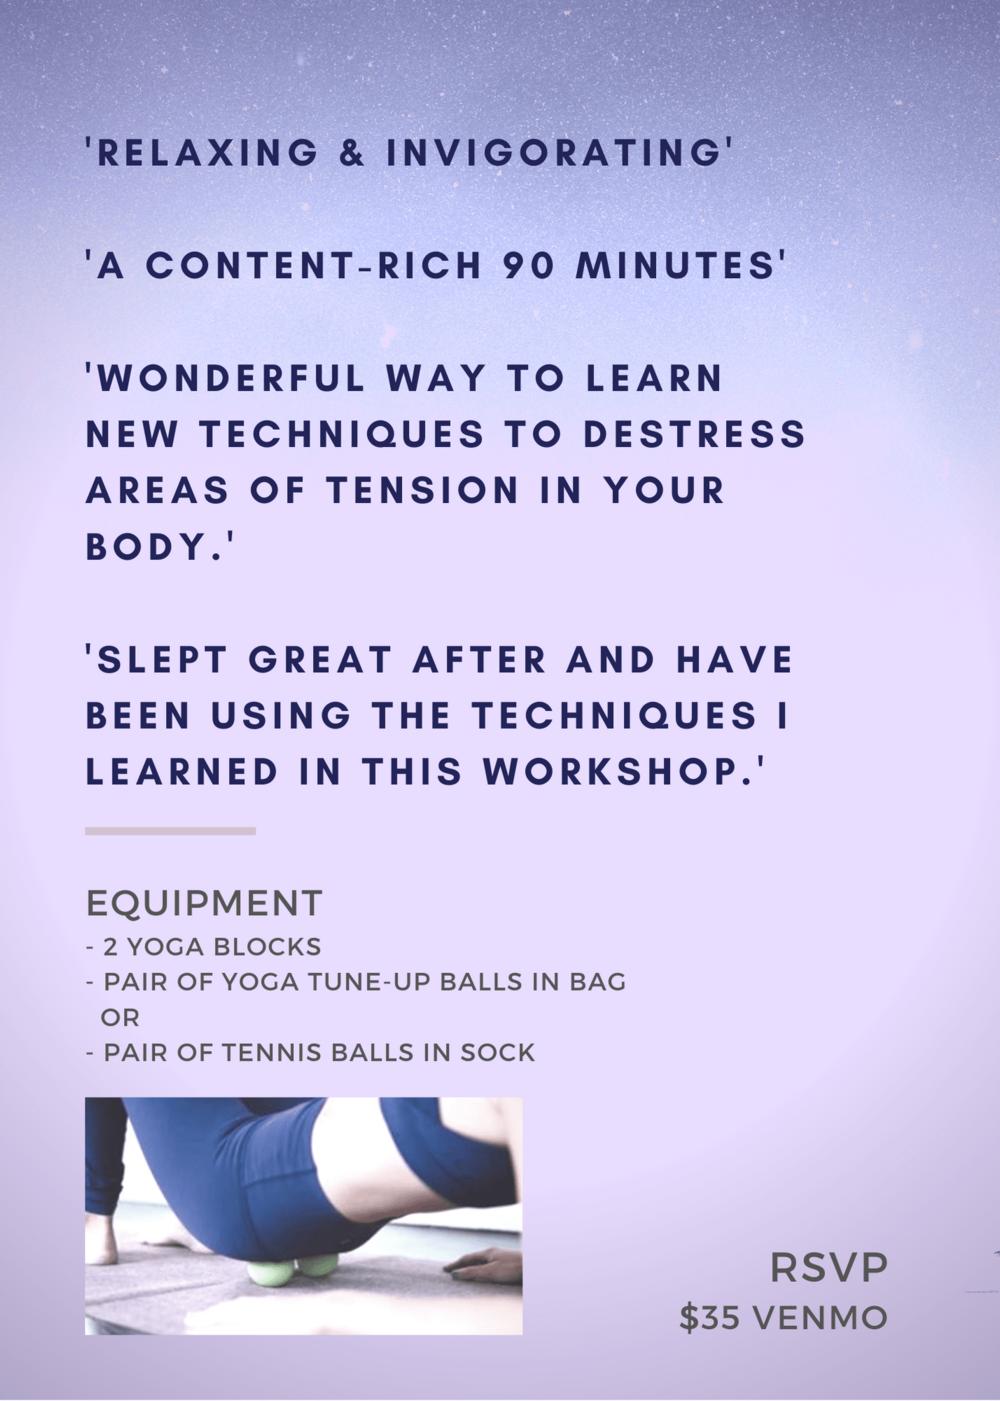 Private-Yoga-Instructor-Santa-Monica-Los-Angeles-Myofascial-Release-Workshop-Feb-27